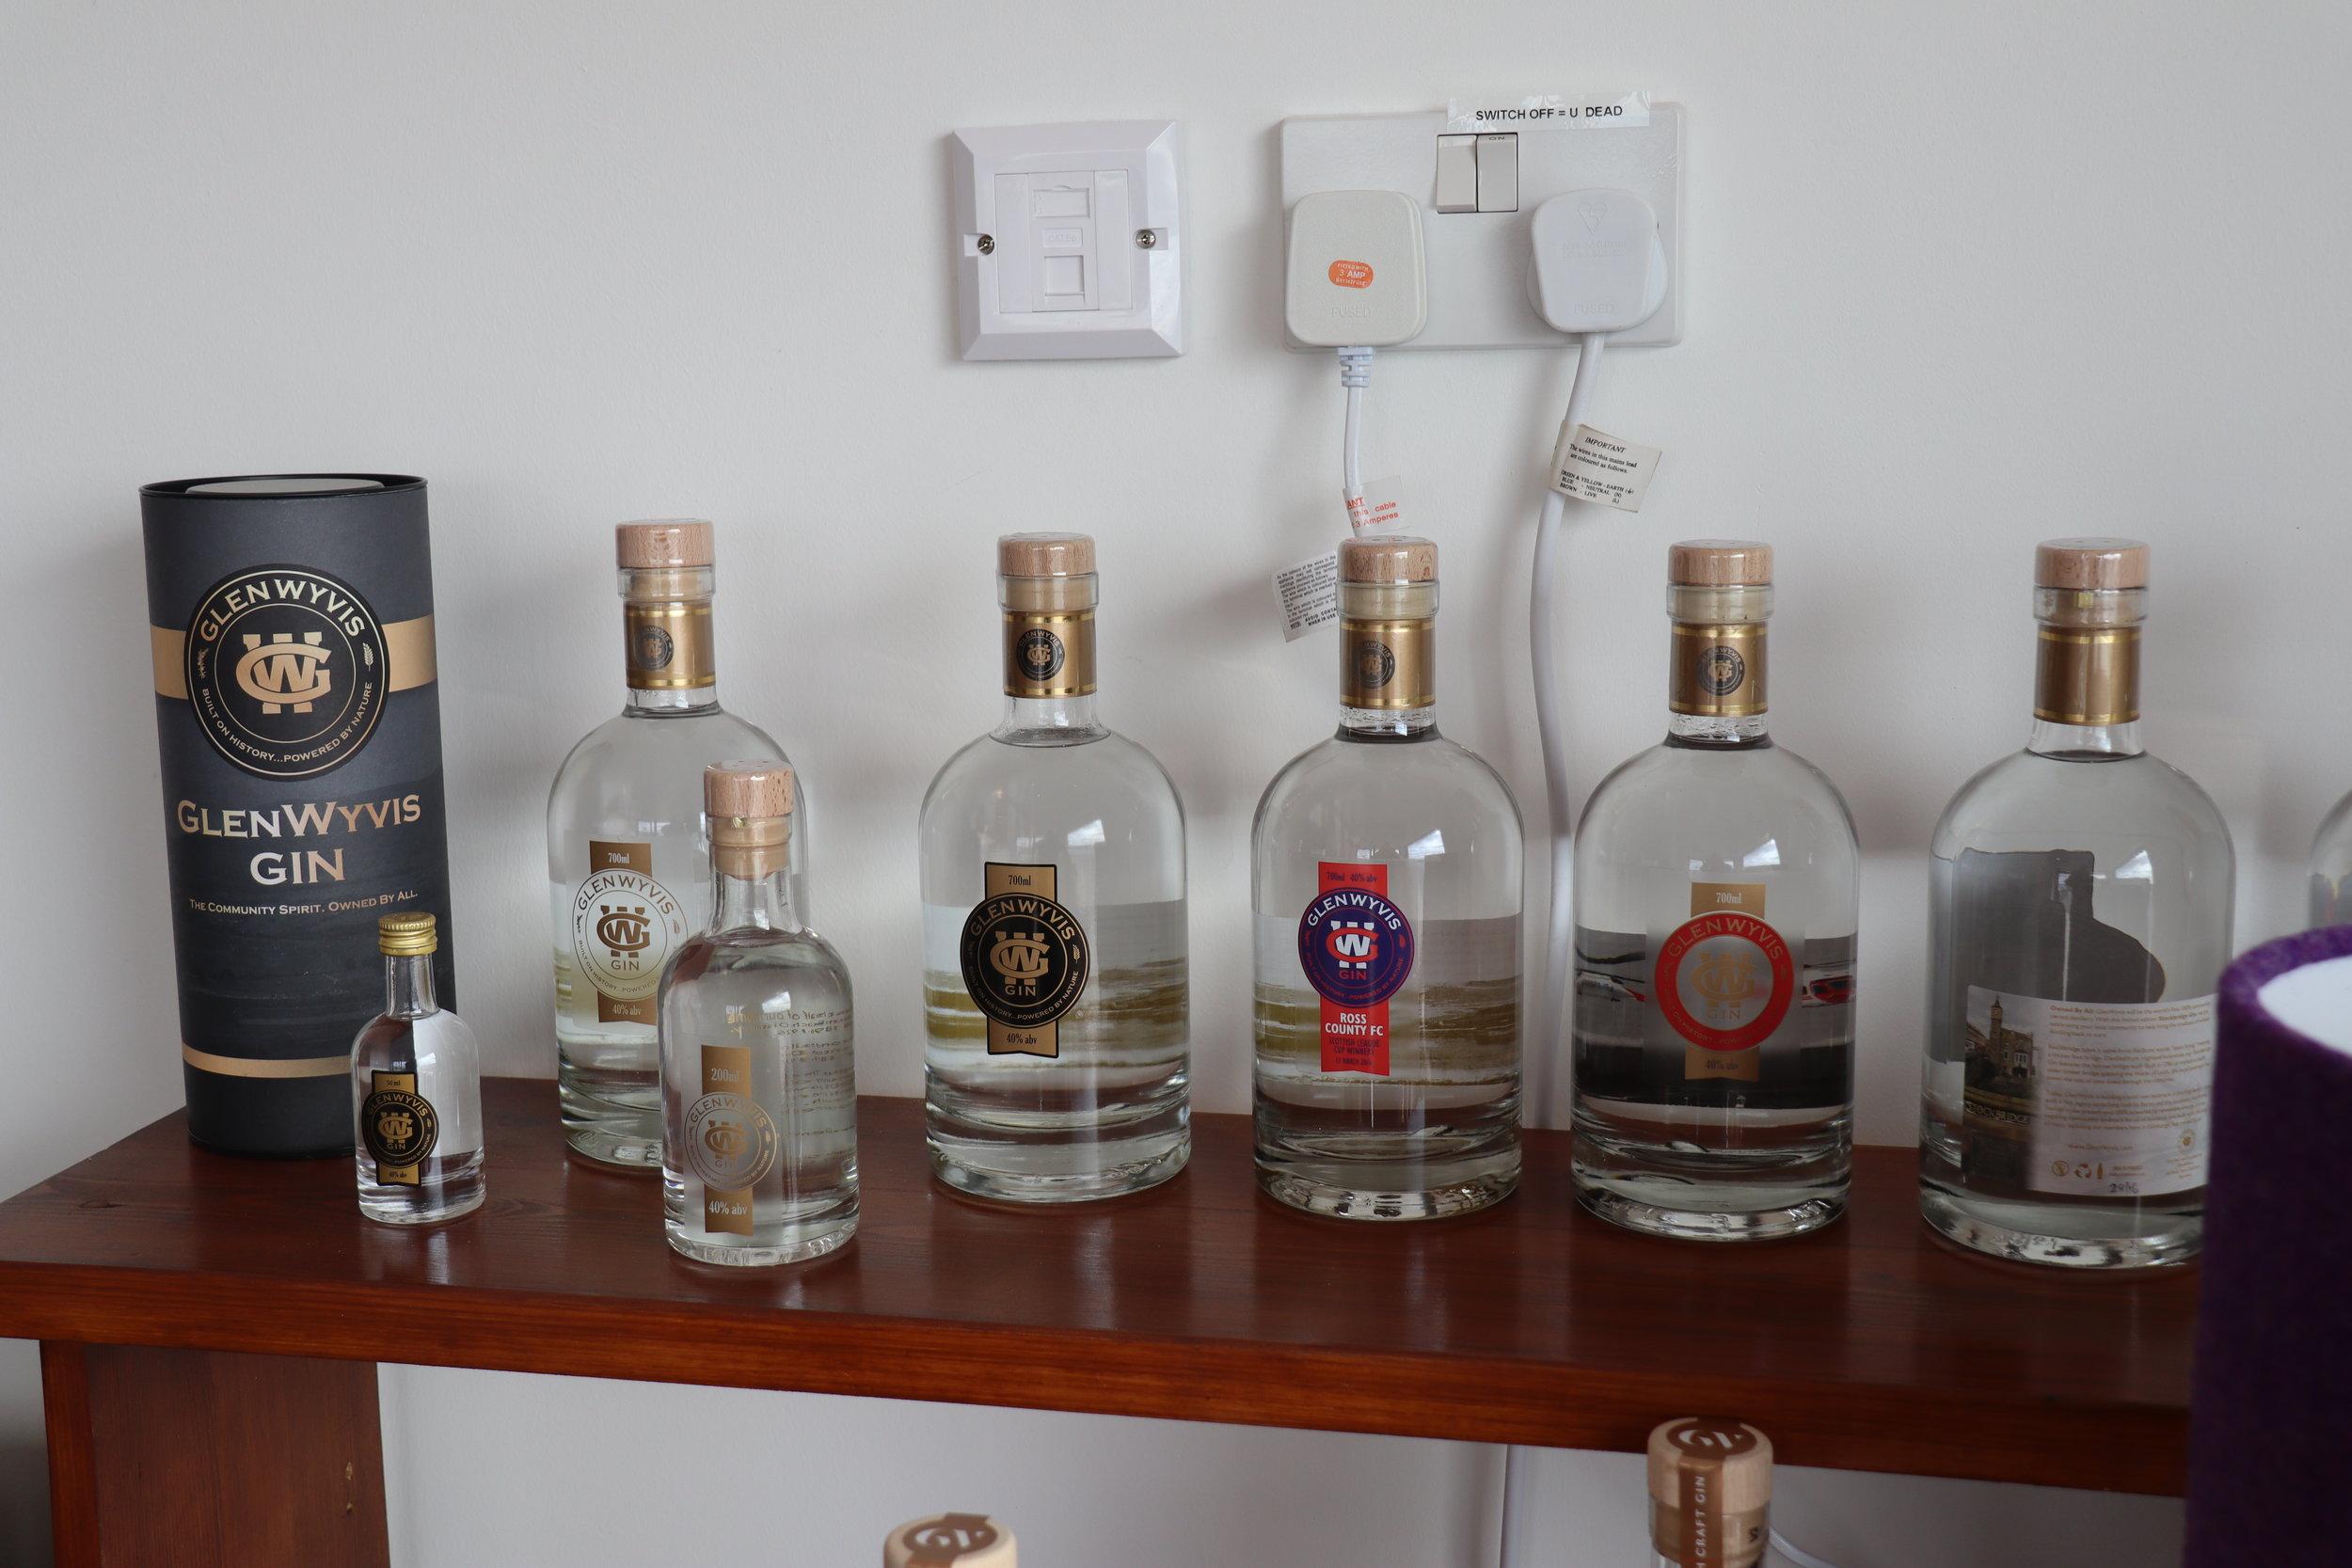 A sampling of the original GlenWyvis gins including the old branding.